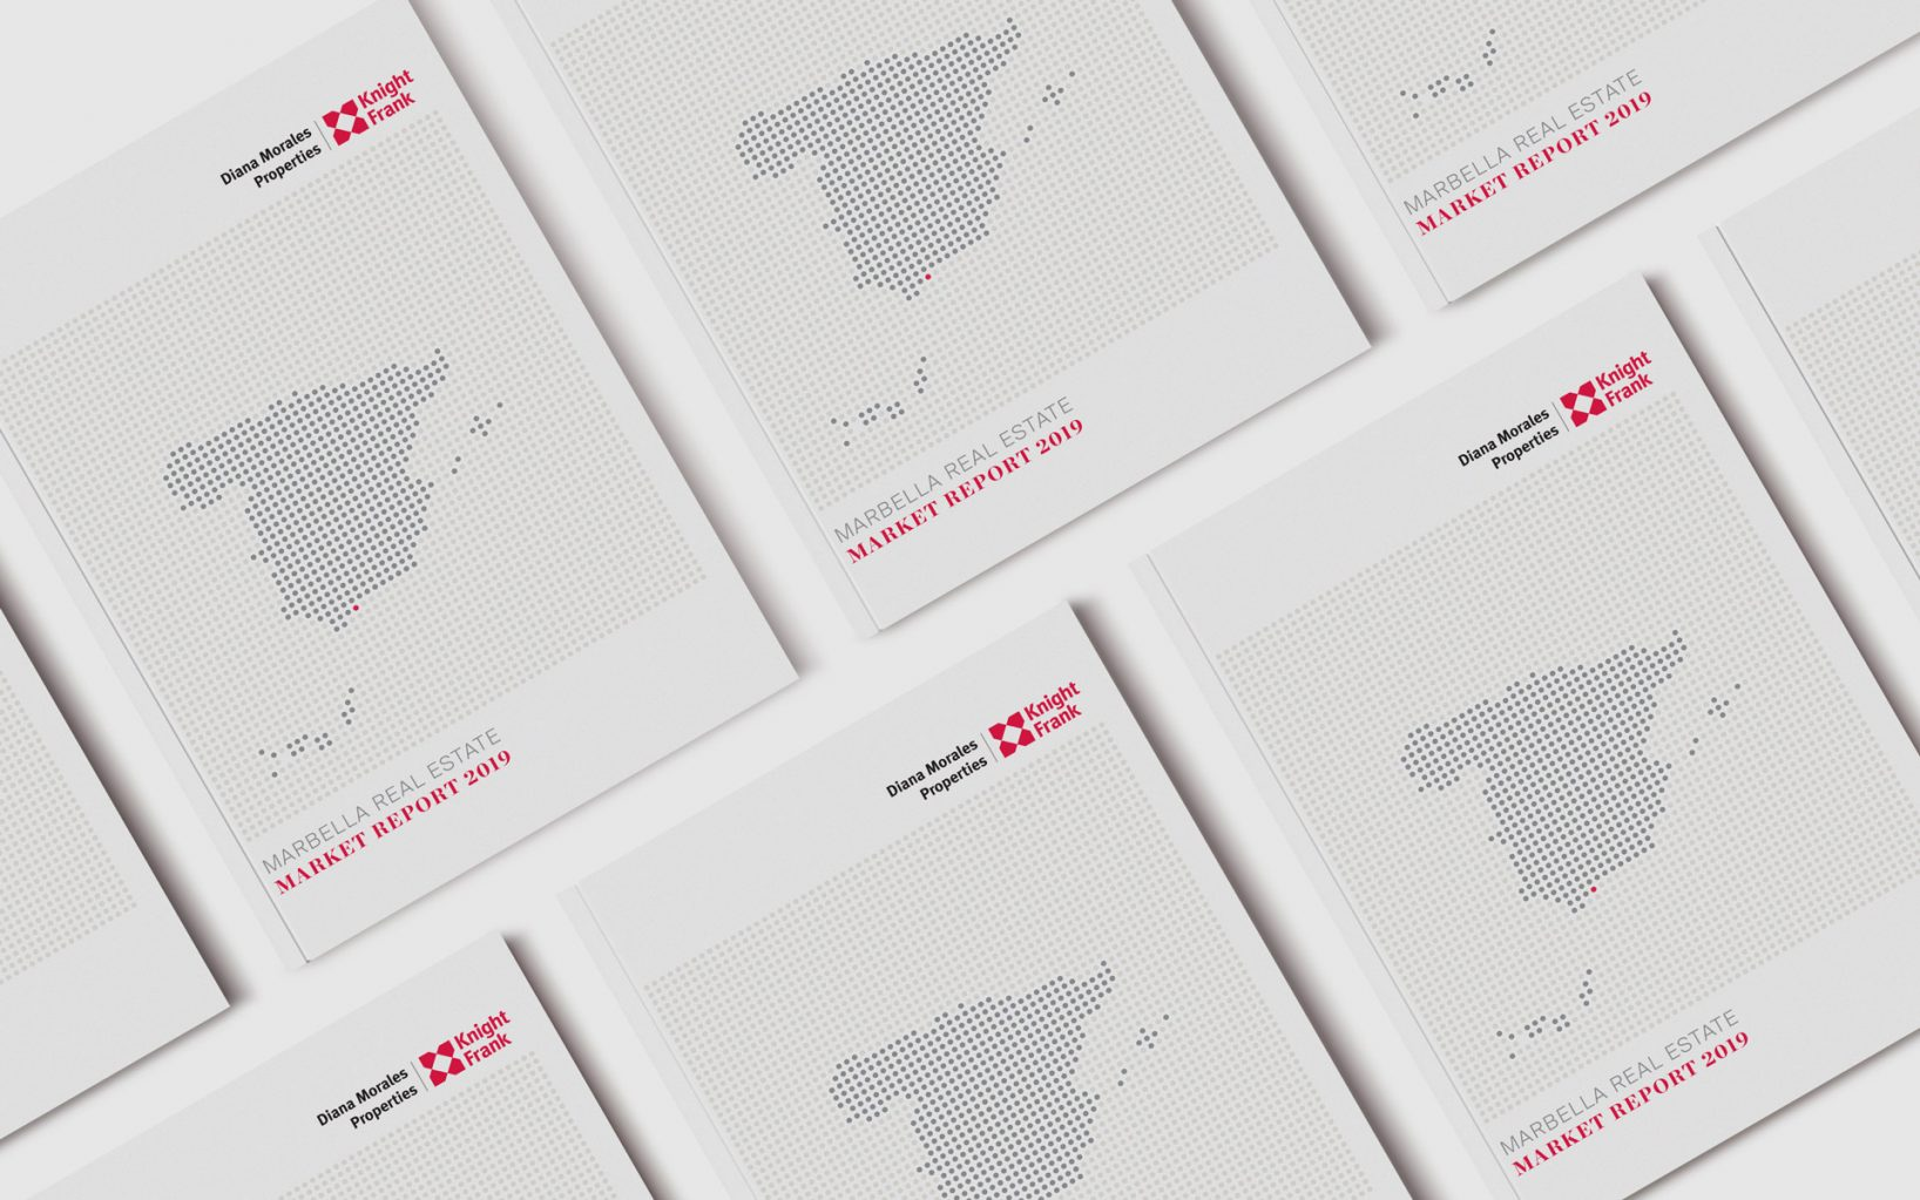 Marbella Real Estate Market Report 2019